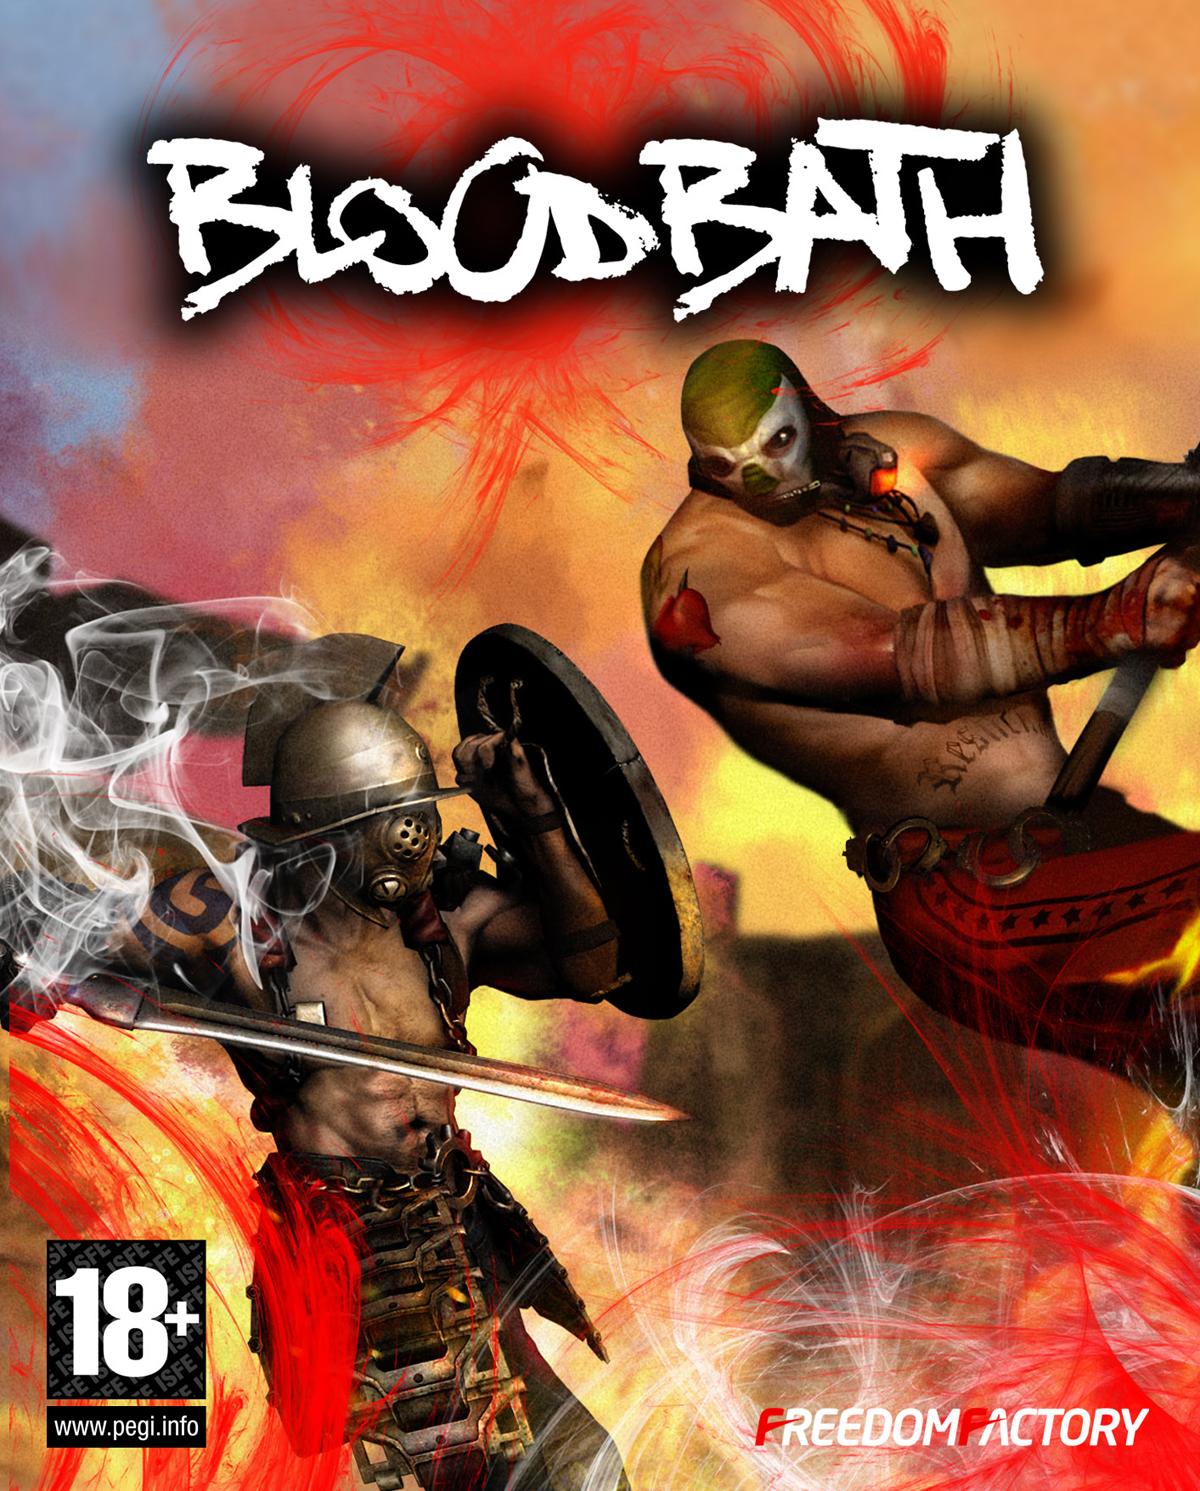 bloodbath packshot